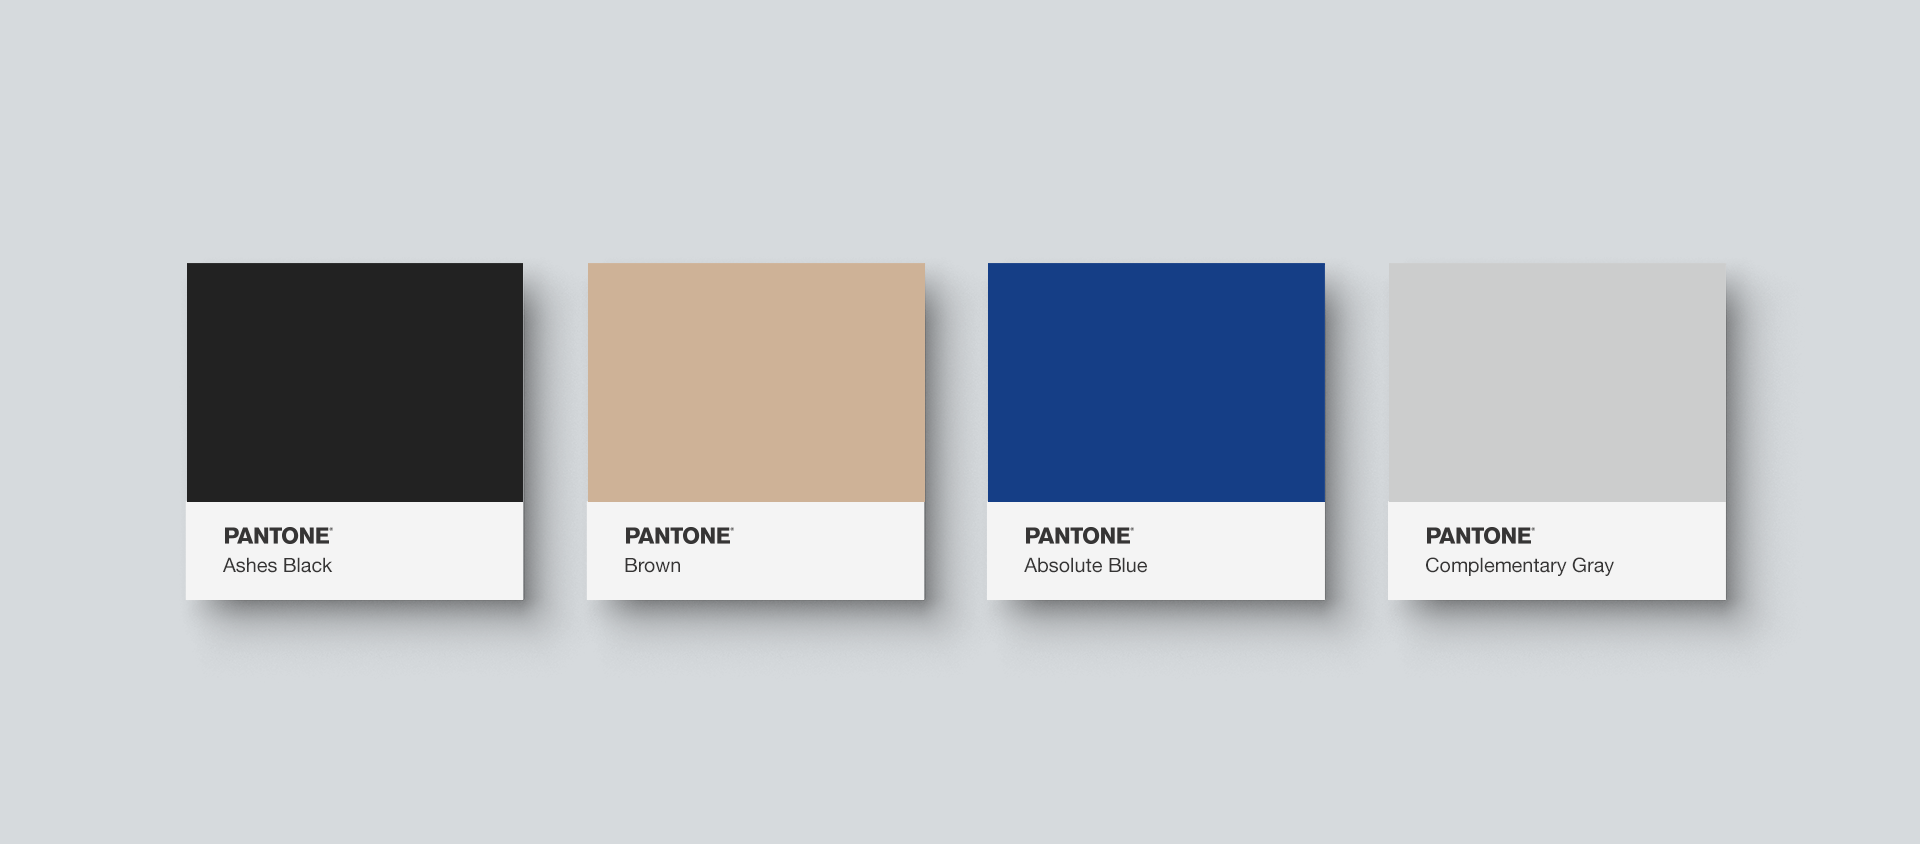 pantone-blake-yoenpaperland